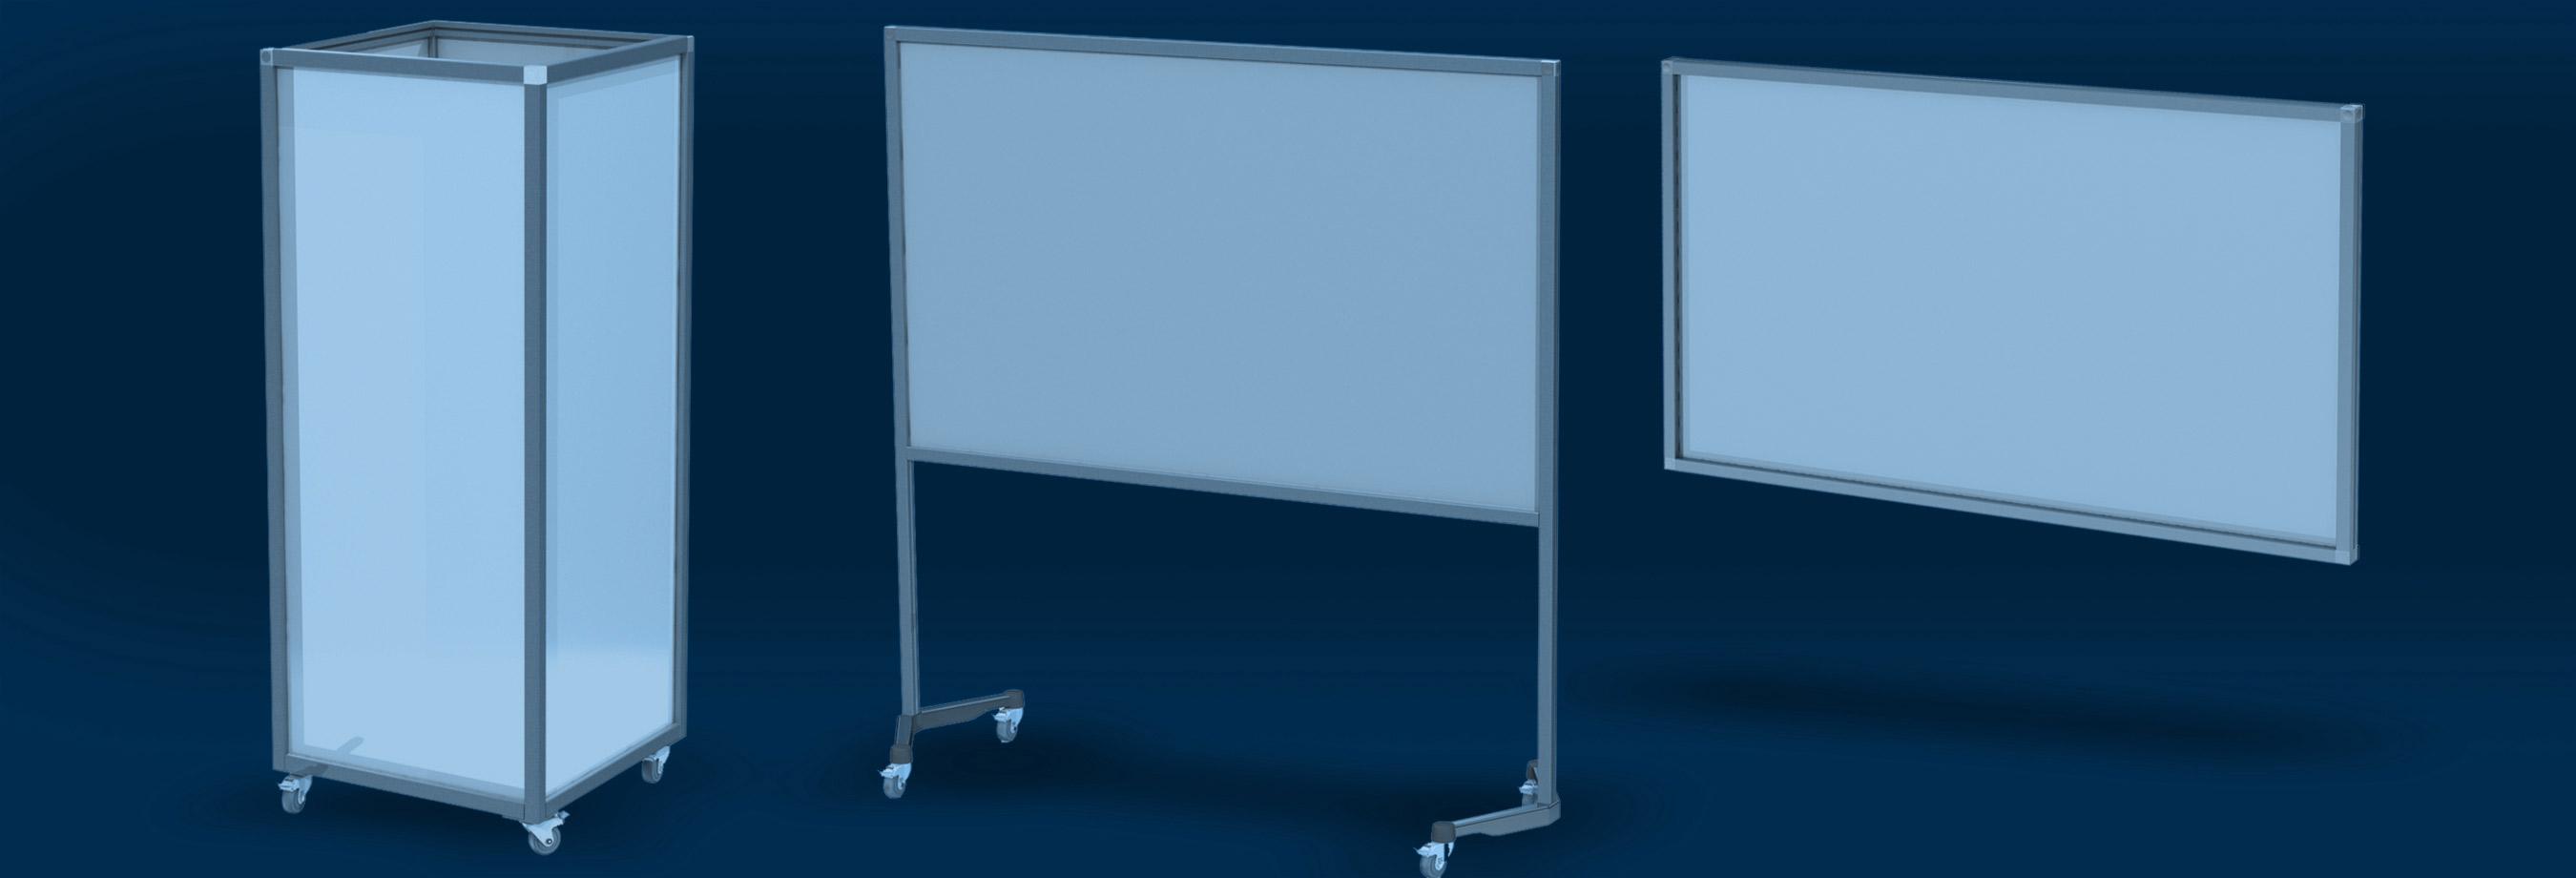 FATH header visual boards